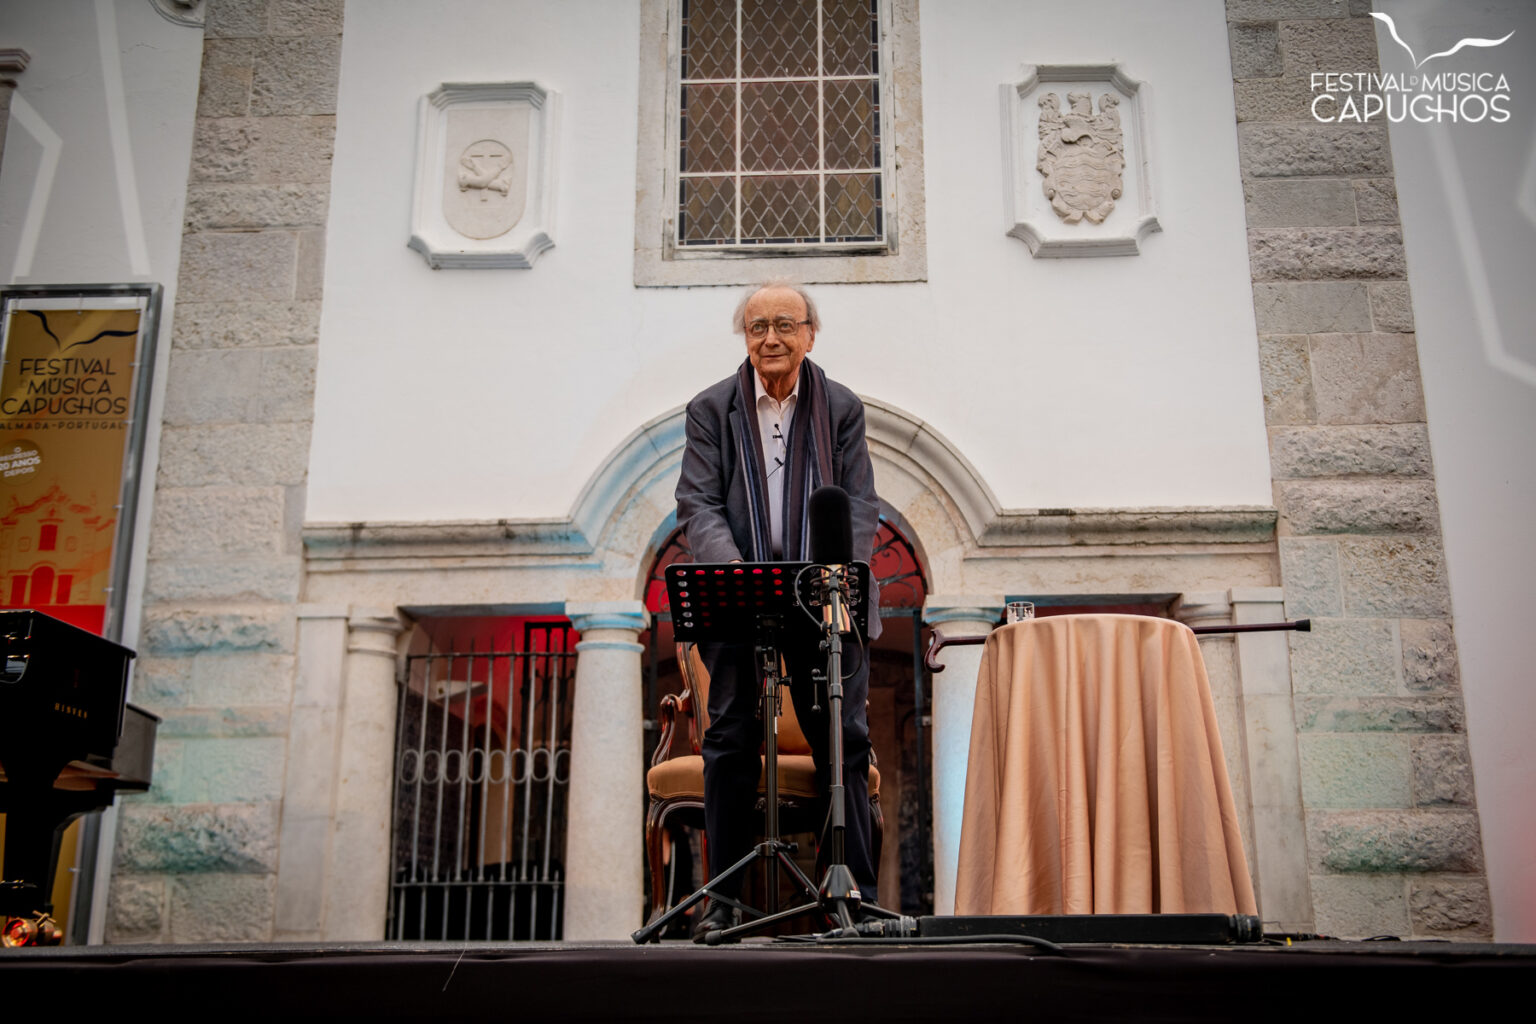 FESTIVAL DOS CAPUCHOS - HOMENAGEM A ALFRED BRENDEL - Conferência com Alfred Brendel